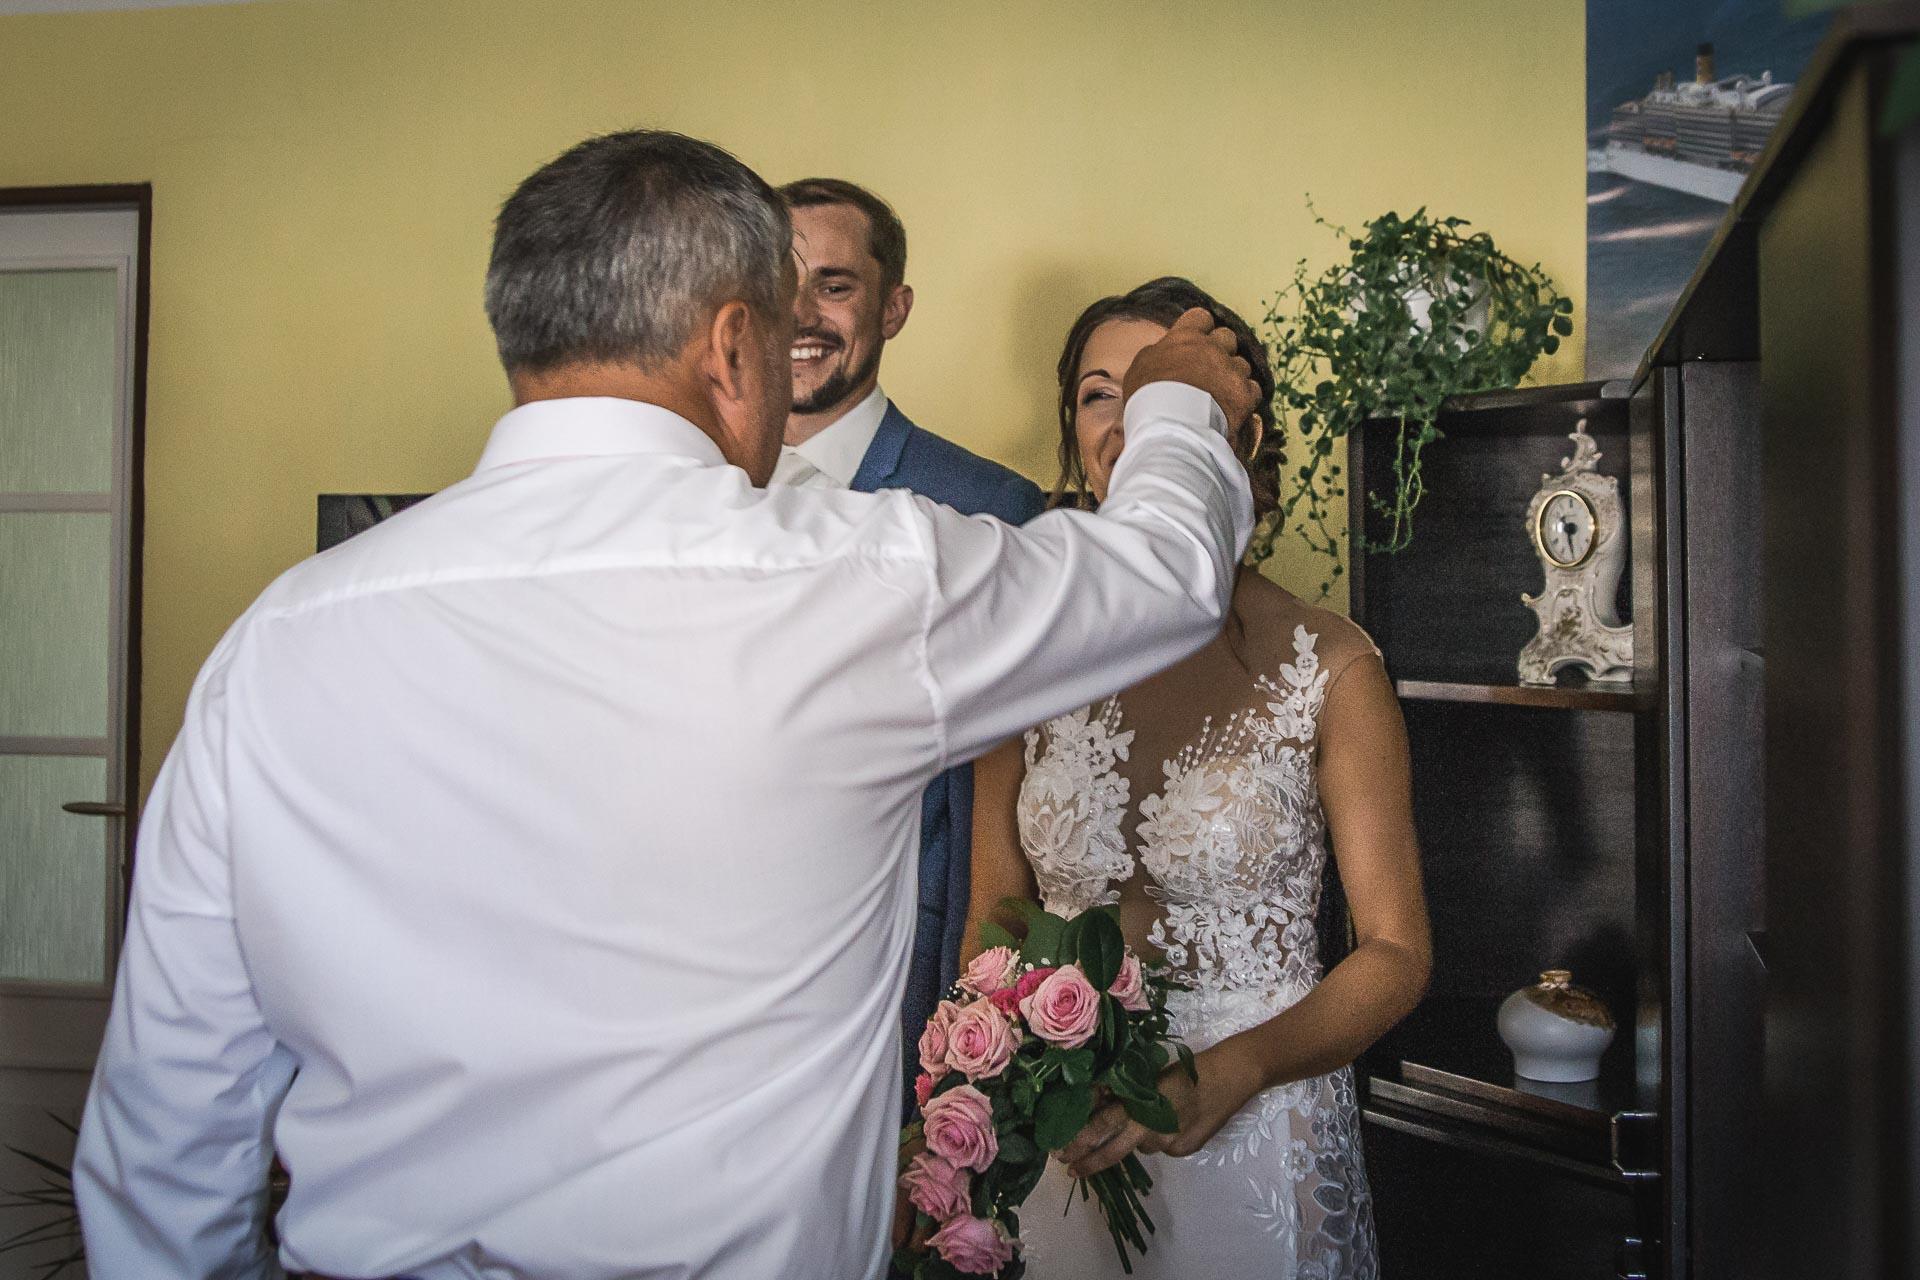 svatební-fotograf-wedding-svatebni-video-orlík-vltava-kostel-statek-stodola-boho-svatba-Beautyfoto-160